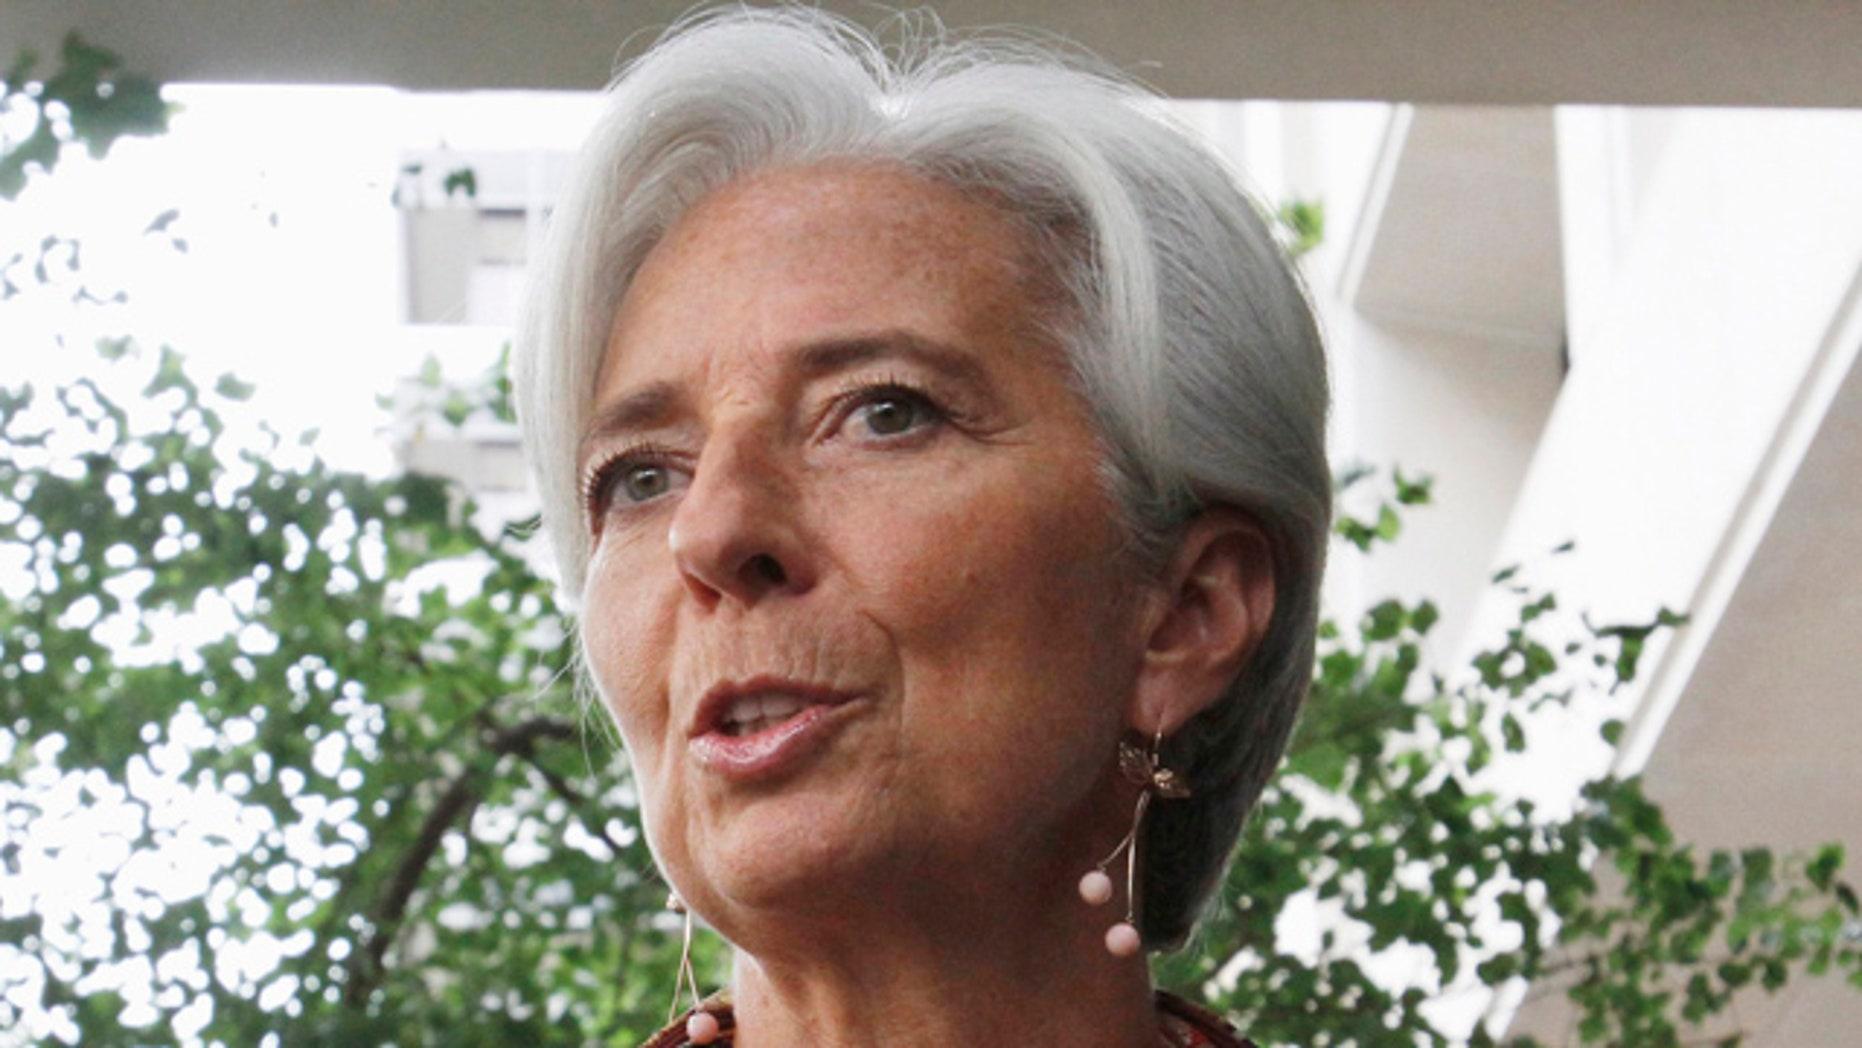 June 23: French Finance Minister Christine Lagarde speaks to the media outside the International Monetary Fund in Washington.